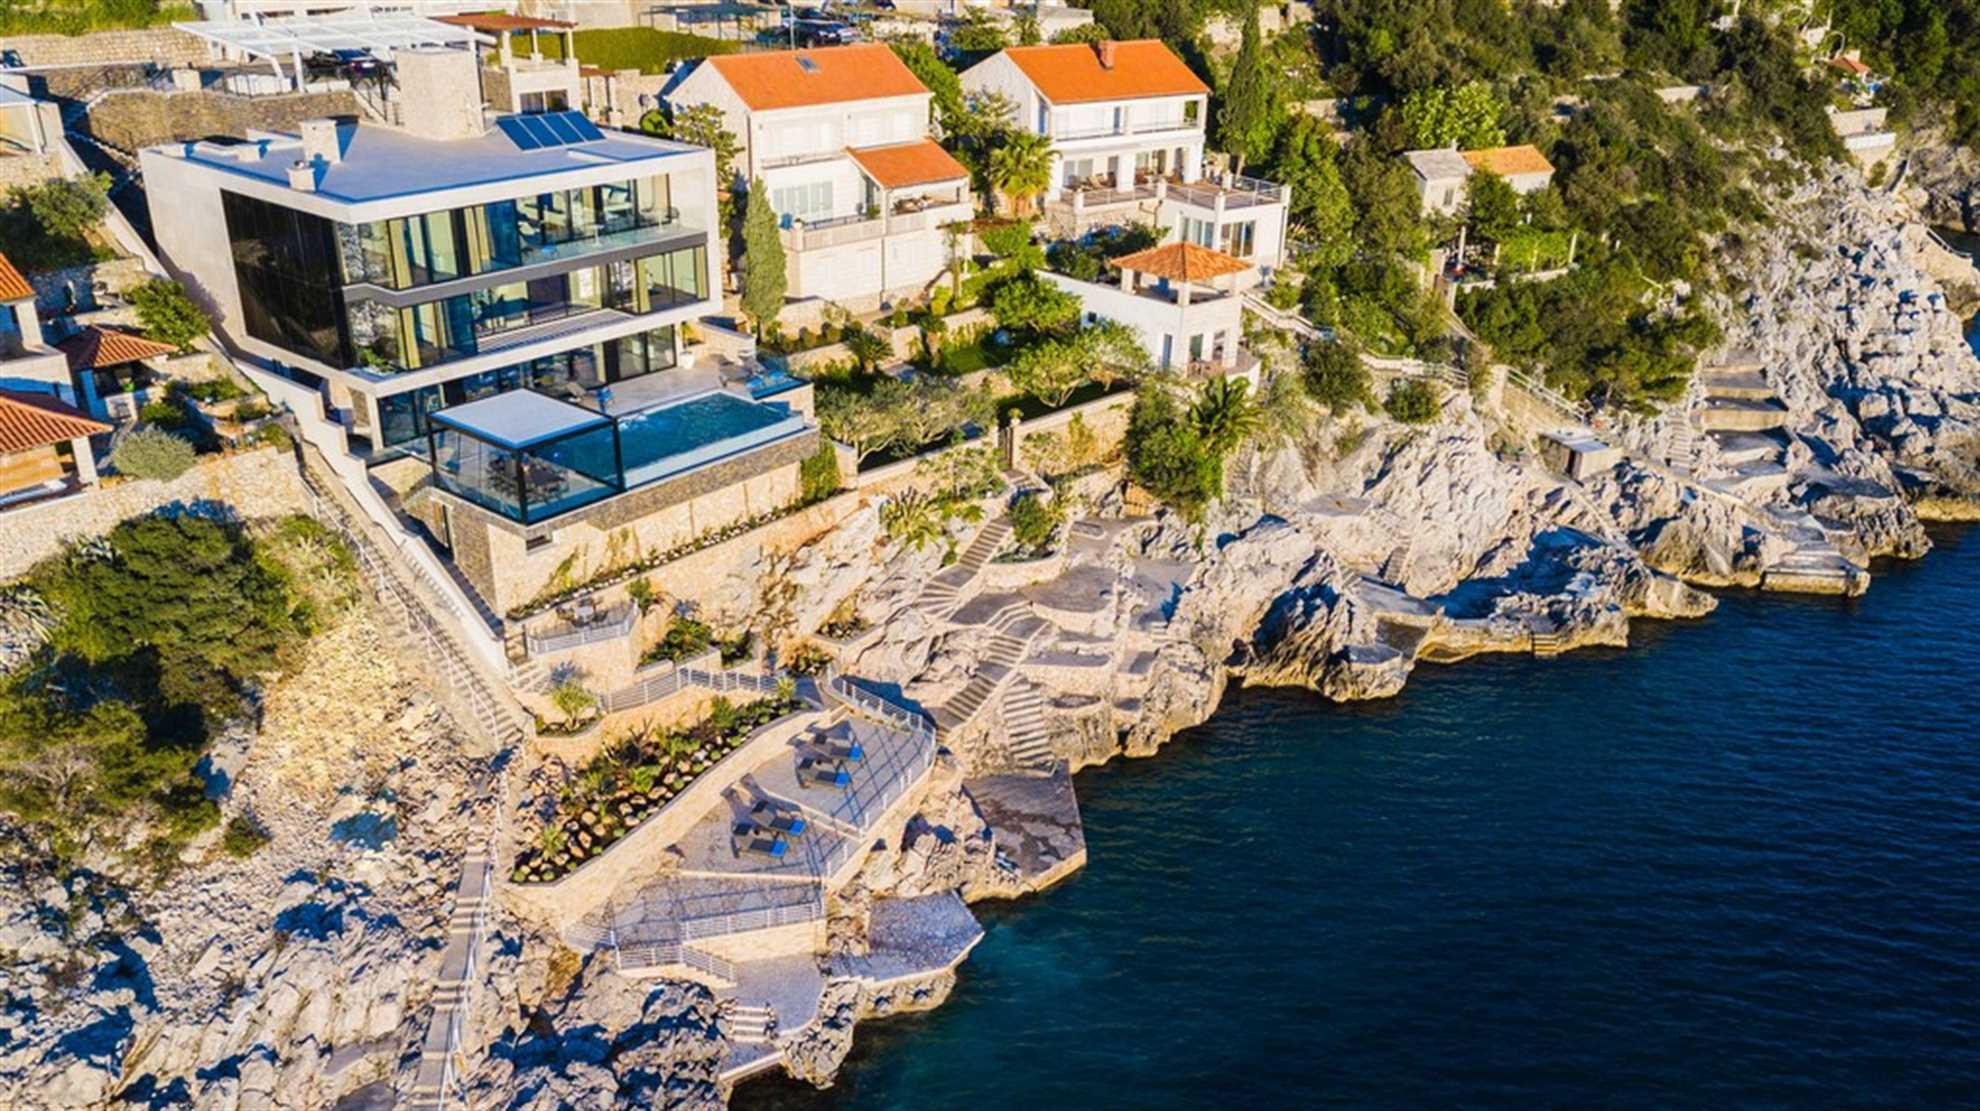 Grand Oceania near Dubrovnik